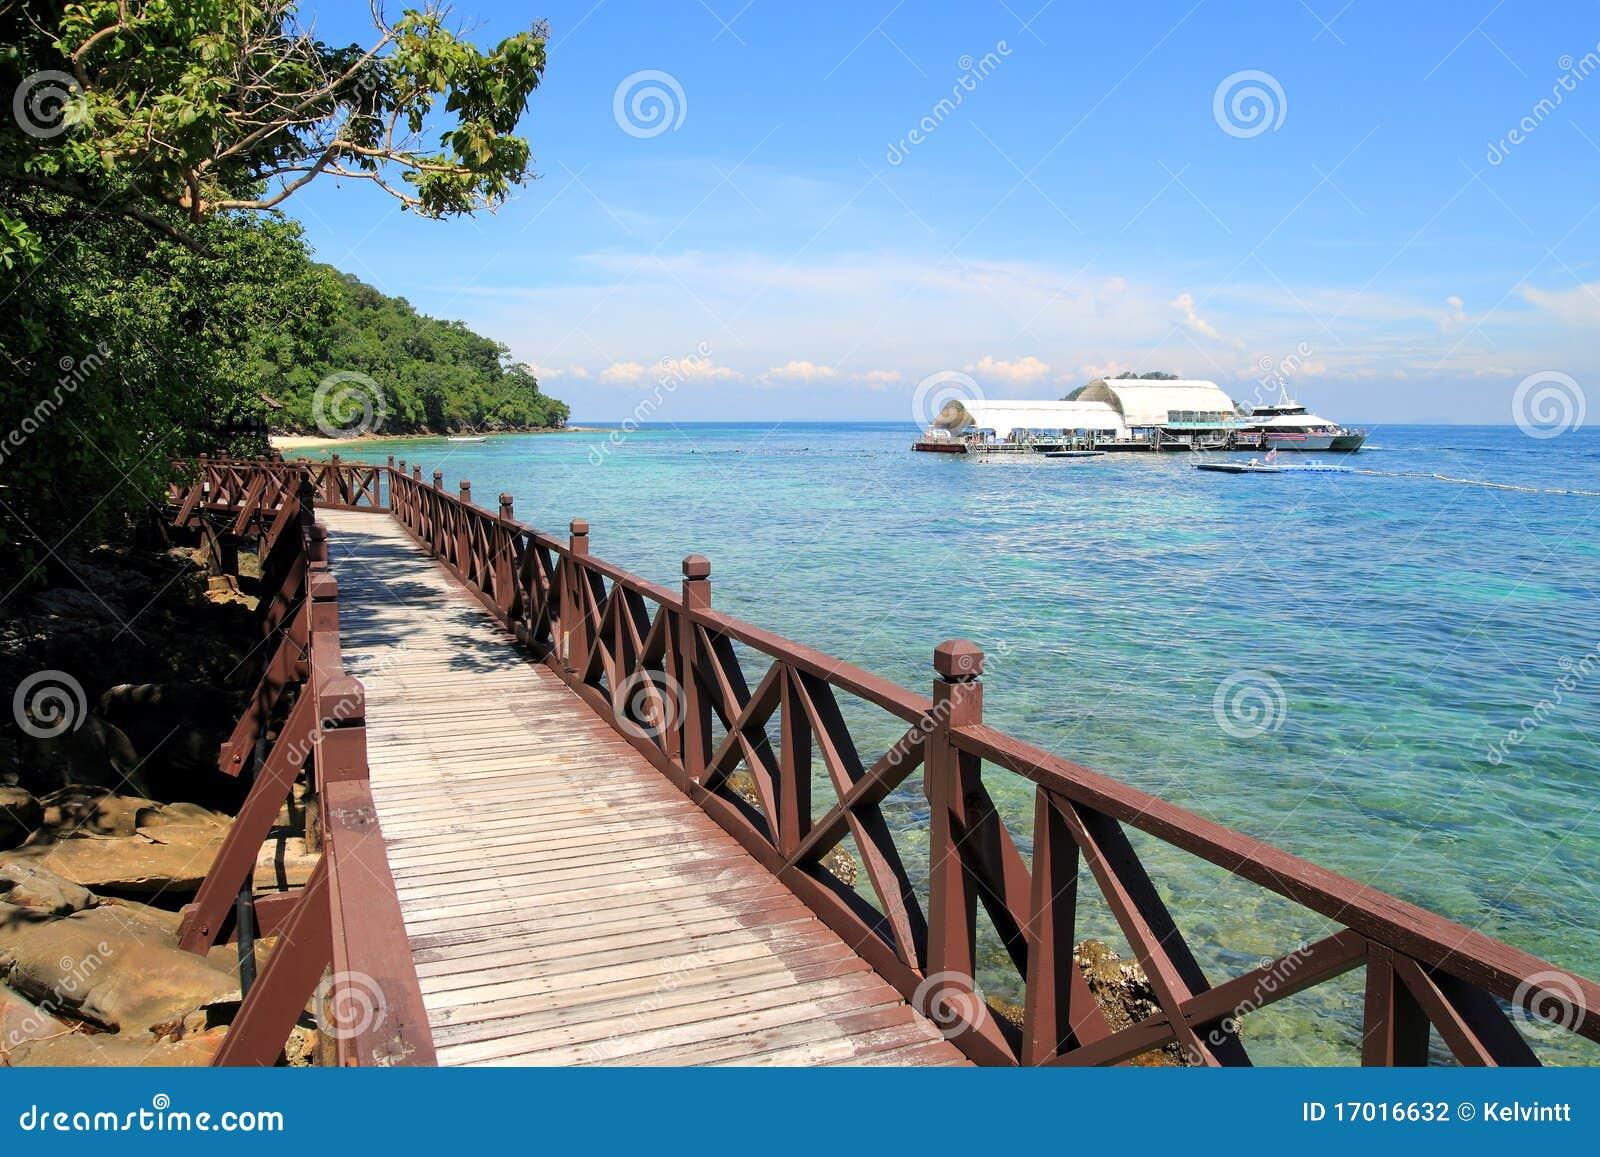 Wooden Walking Path at Beach